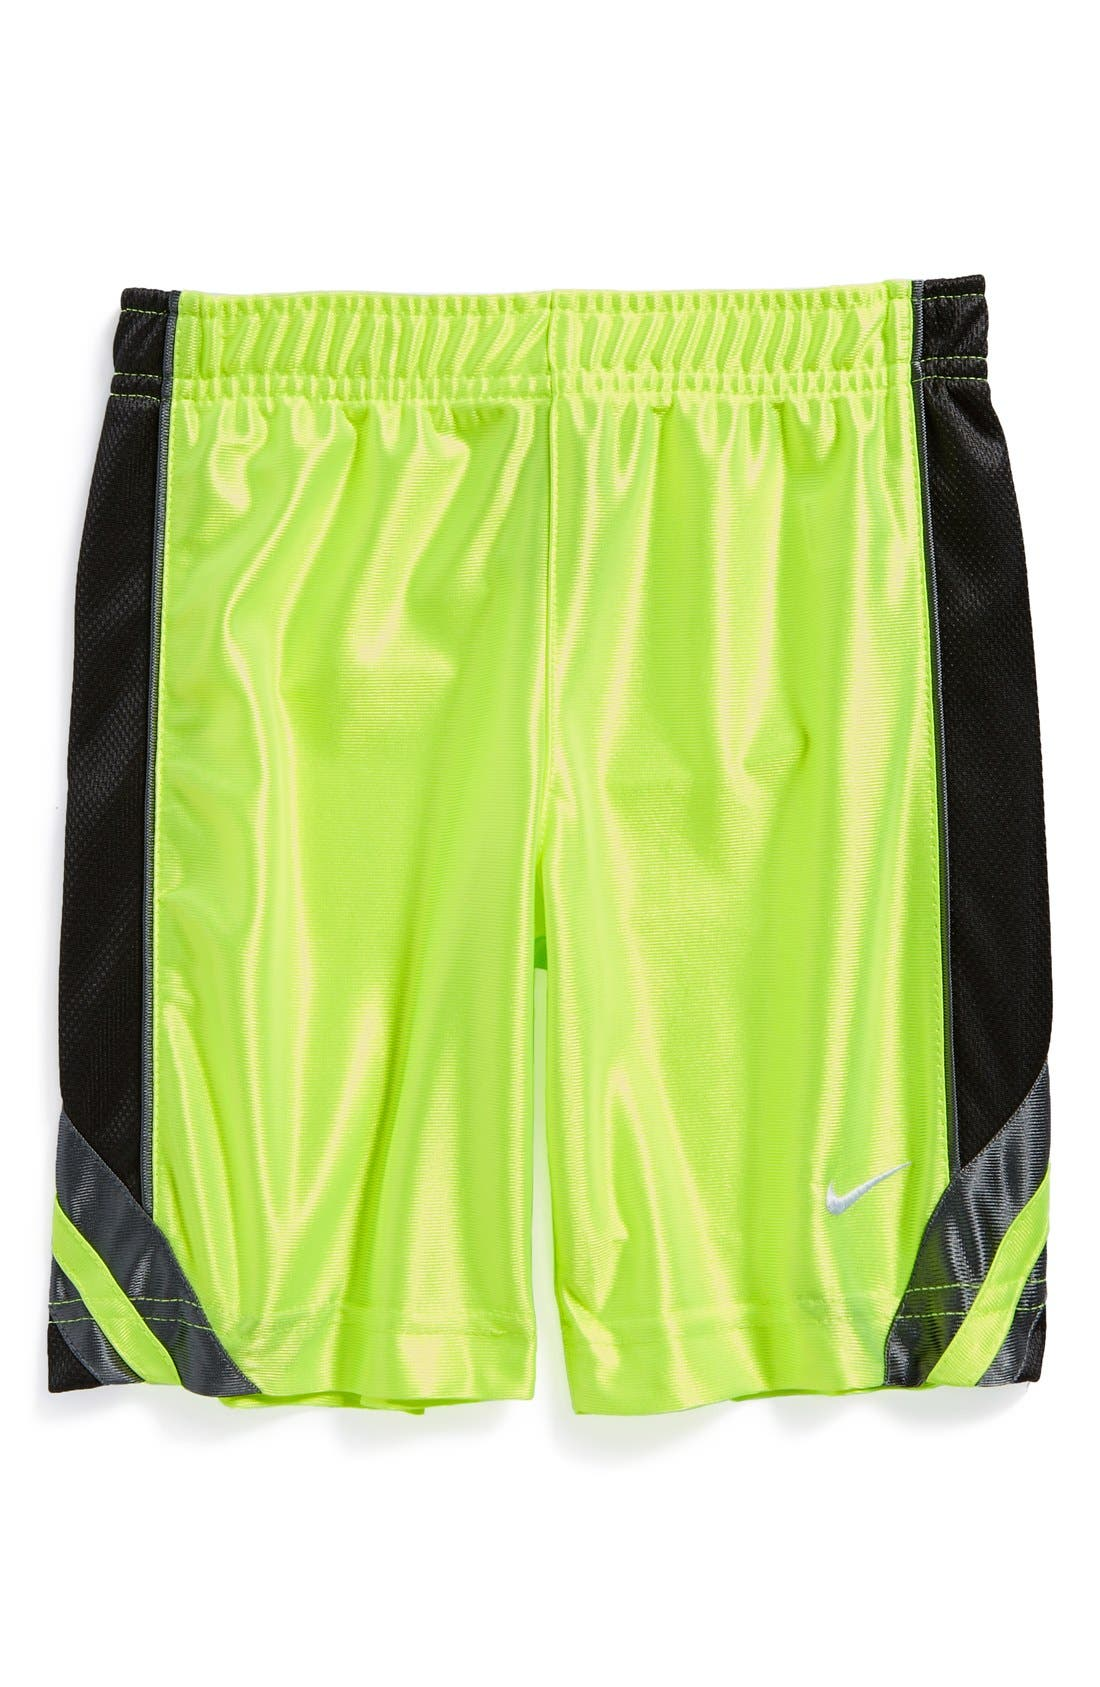 Main Image - Nike 'Dunk V2' Shorts (Little Boys)